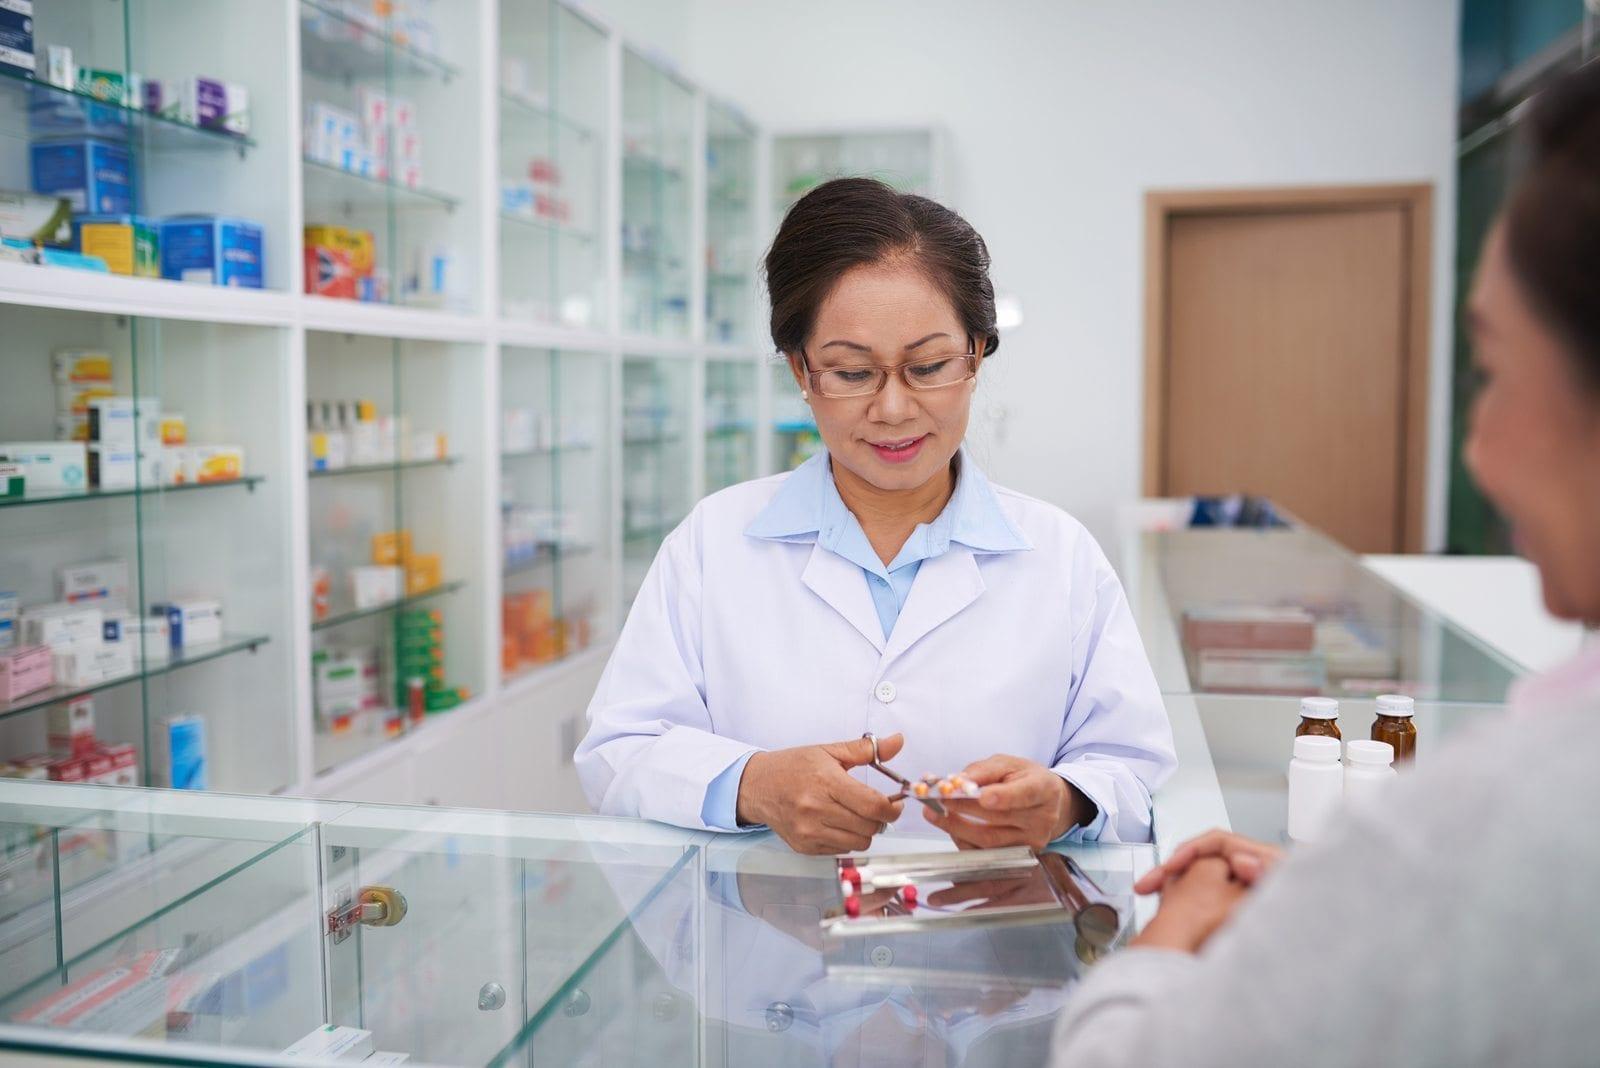 pharmacy technician programs perrysburg oh